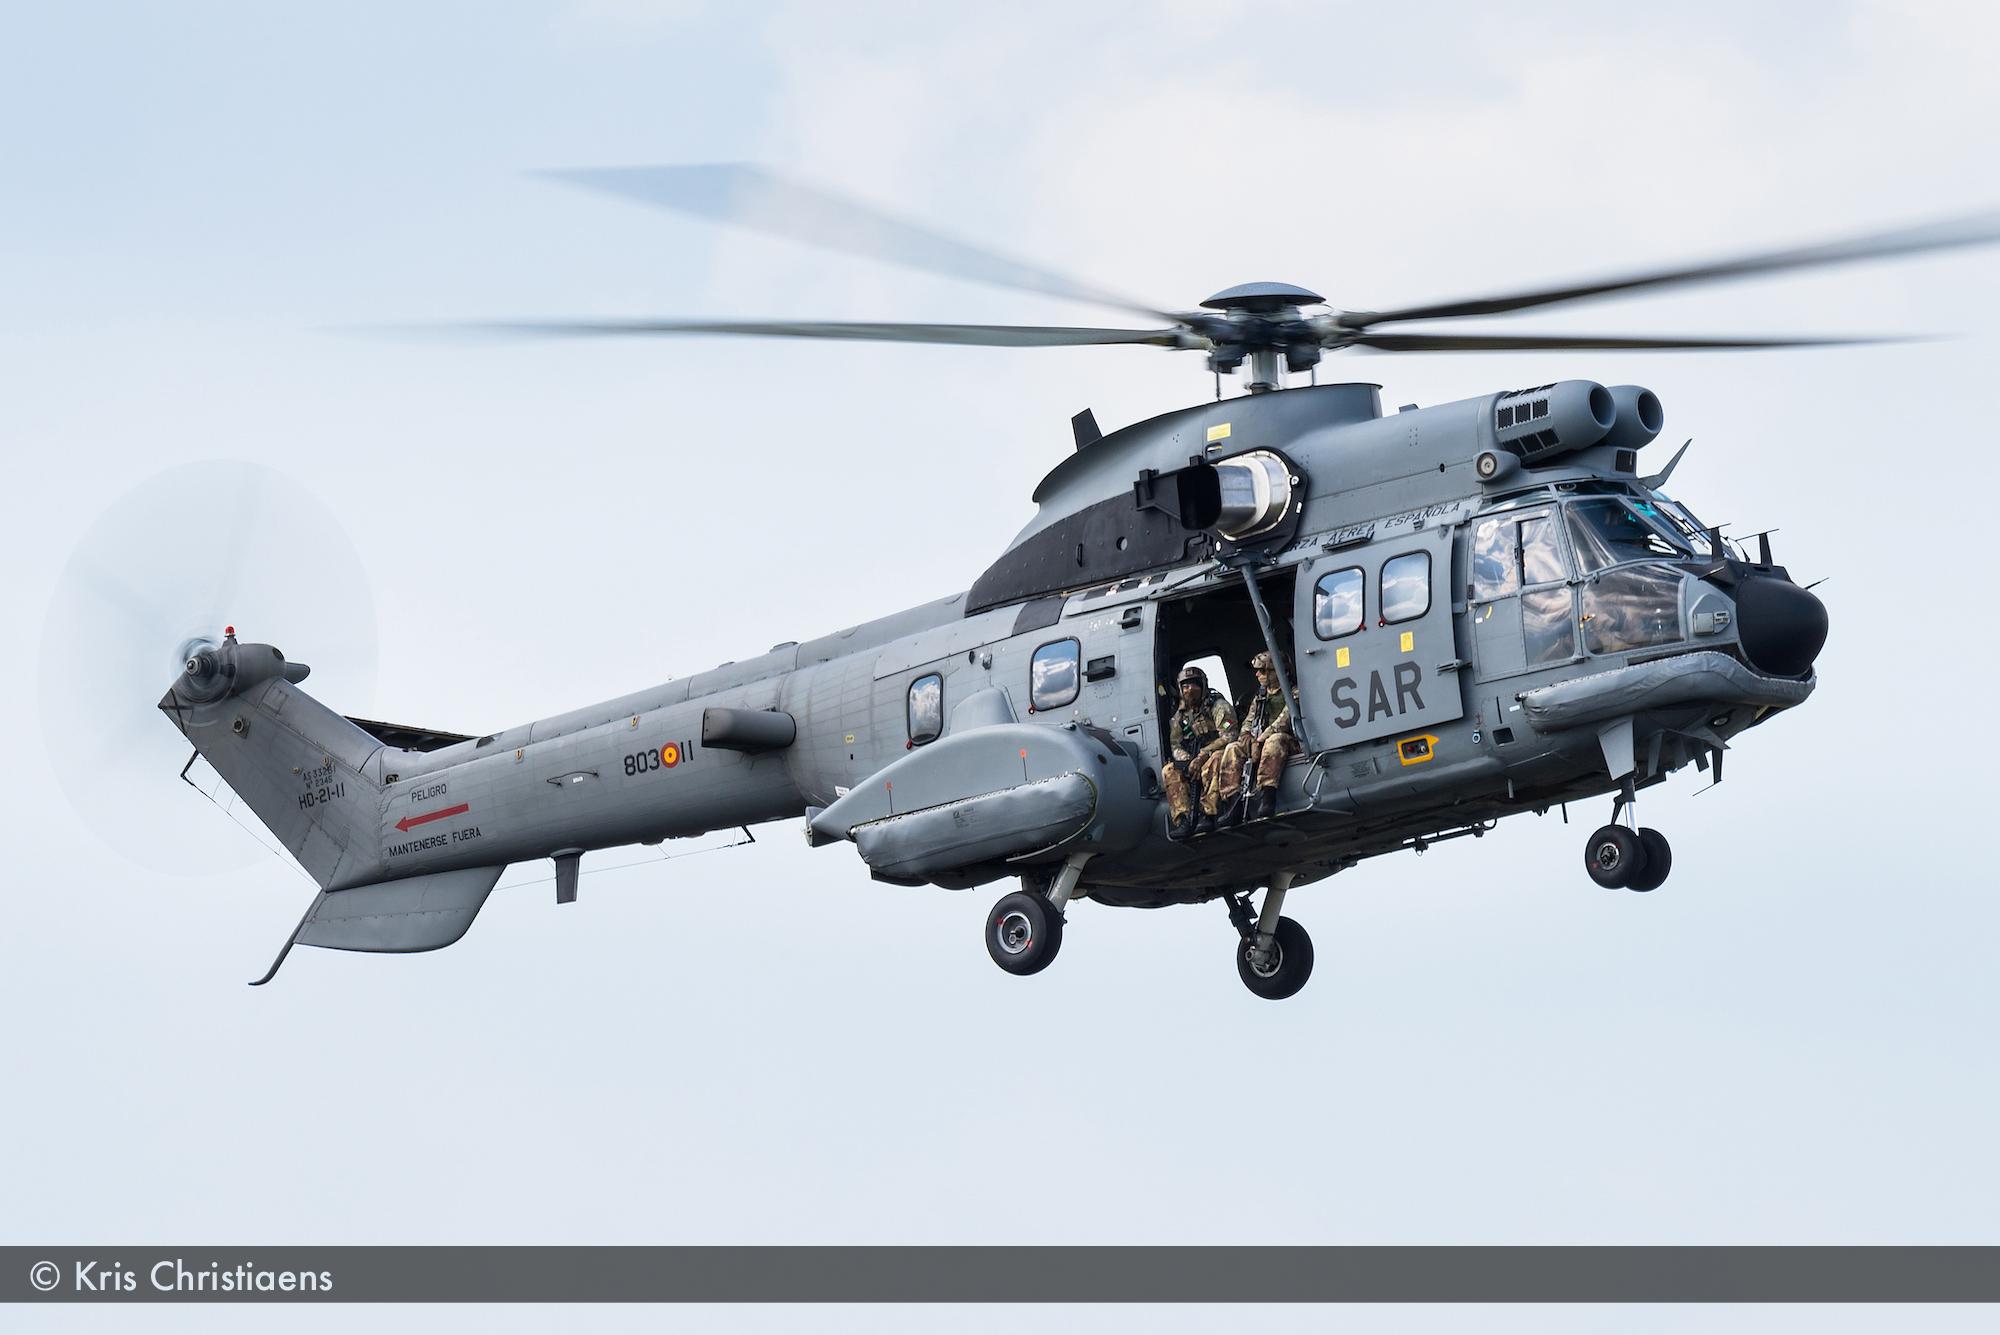 Eurocopter AS332 Super Puma